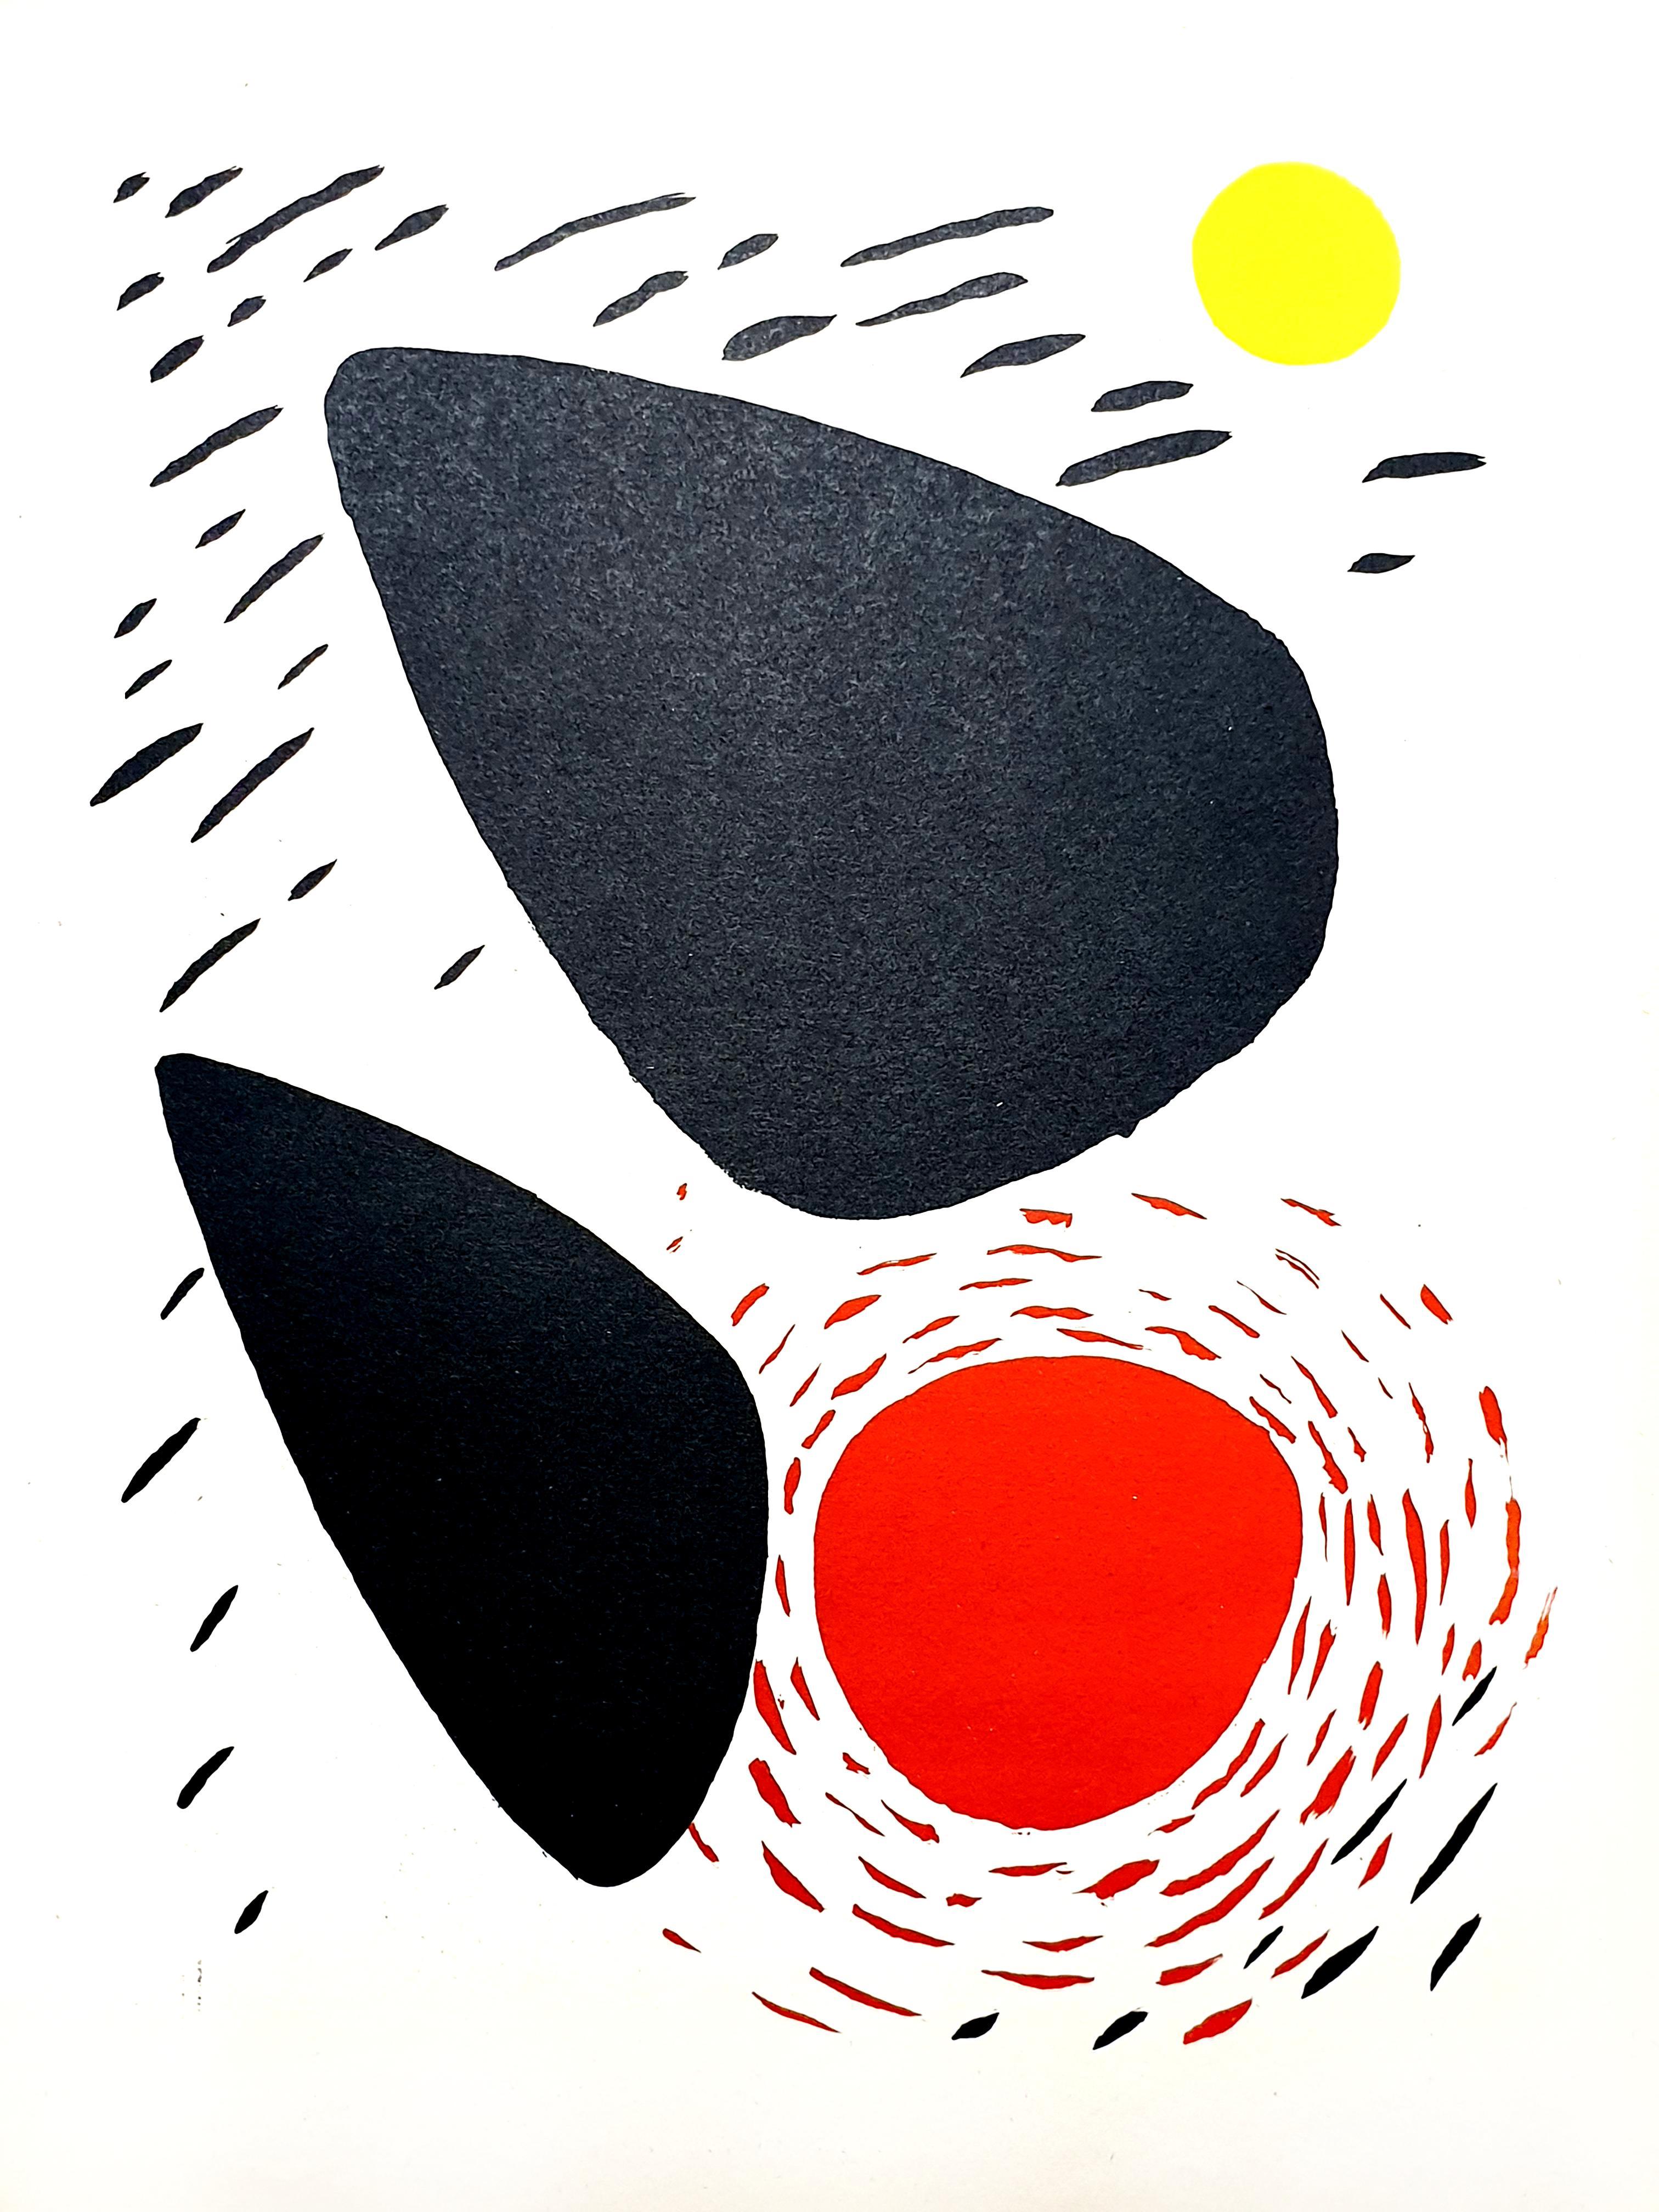 Alexander Calder - Rocks and Sun - Original Lithograph